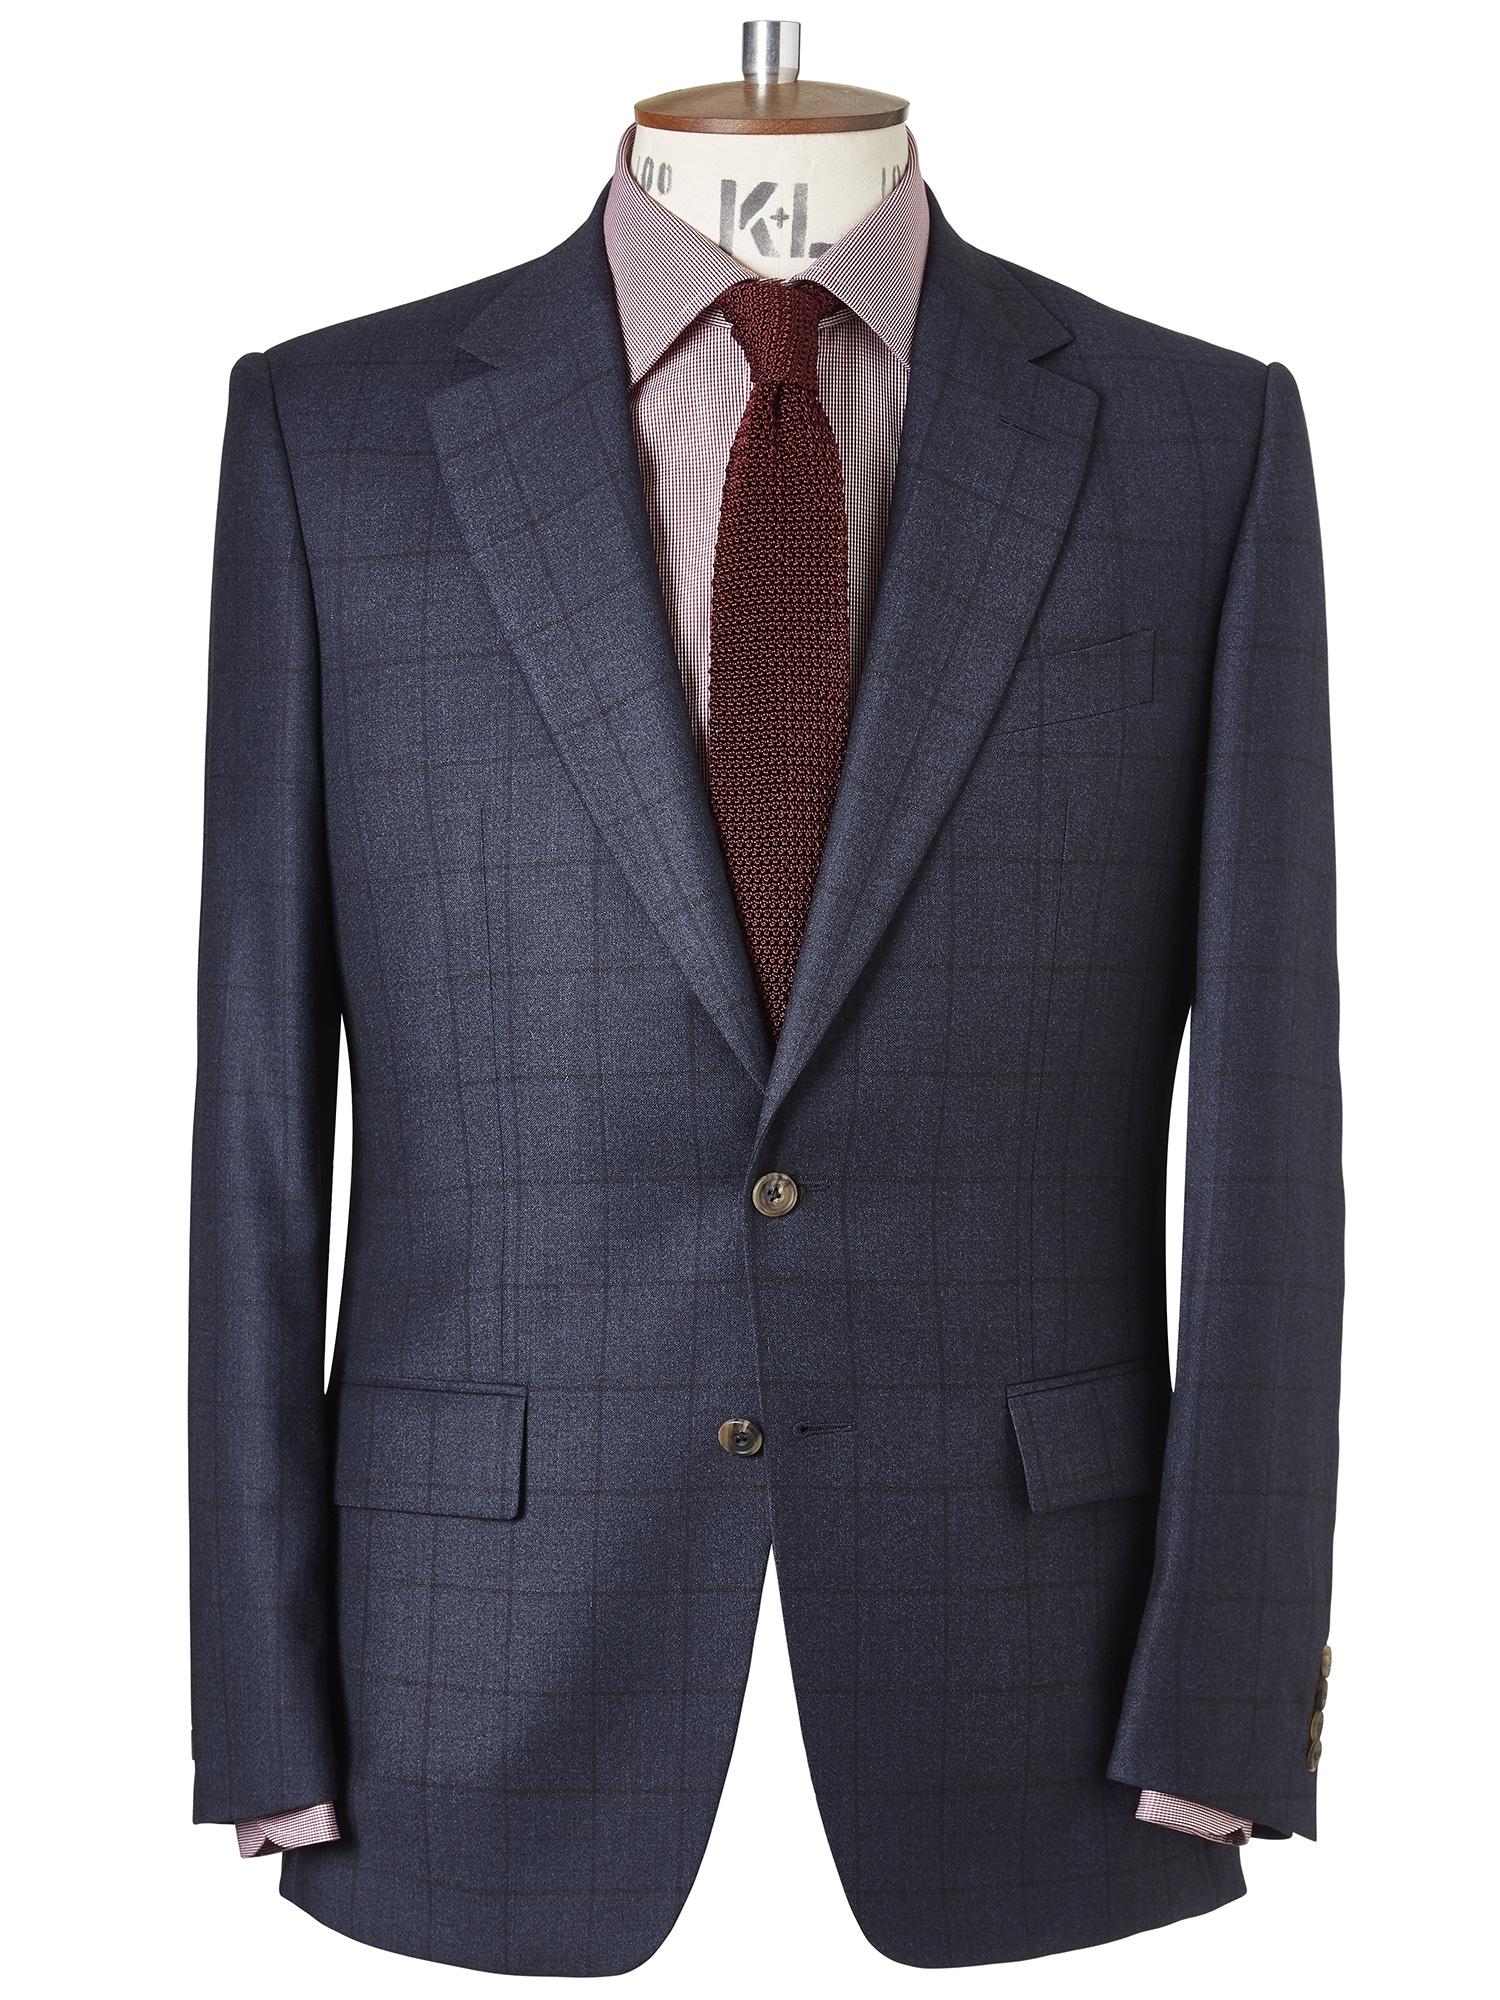 CHESTER BARRIE Windowpane Check Elverton Suit